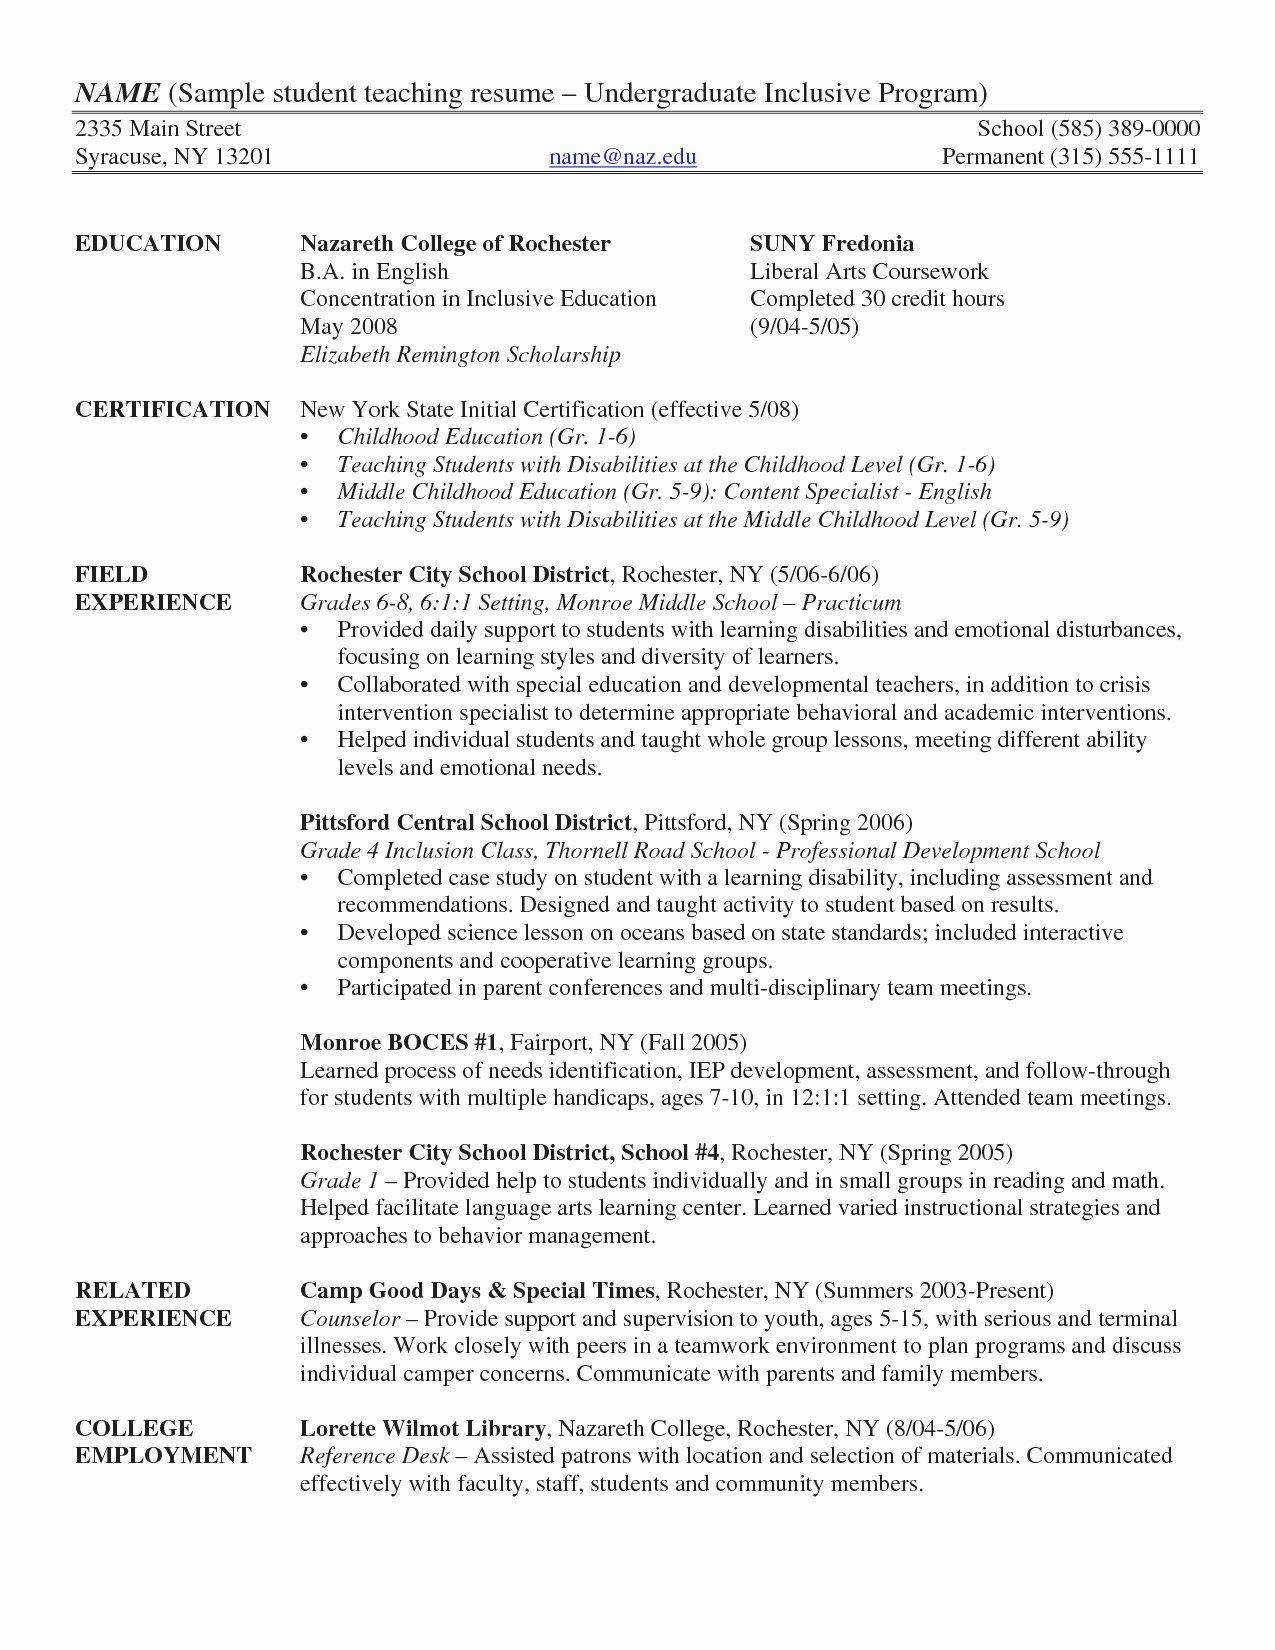 Undergraduate Resume Template Word New Resume Template Undergraduate Resume Template Word